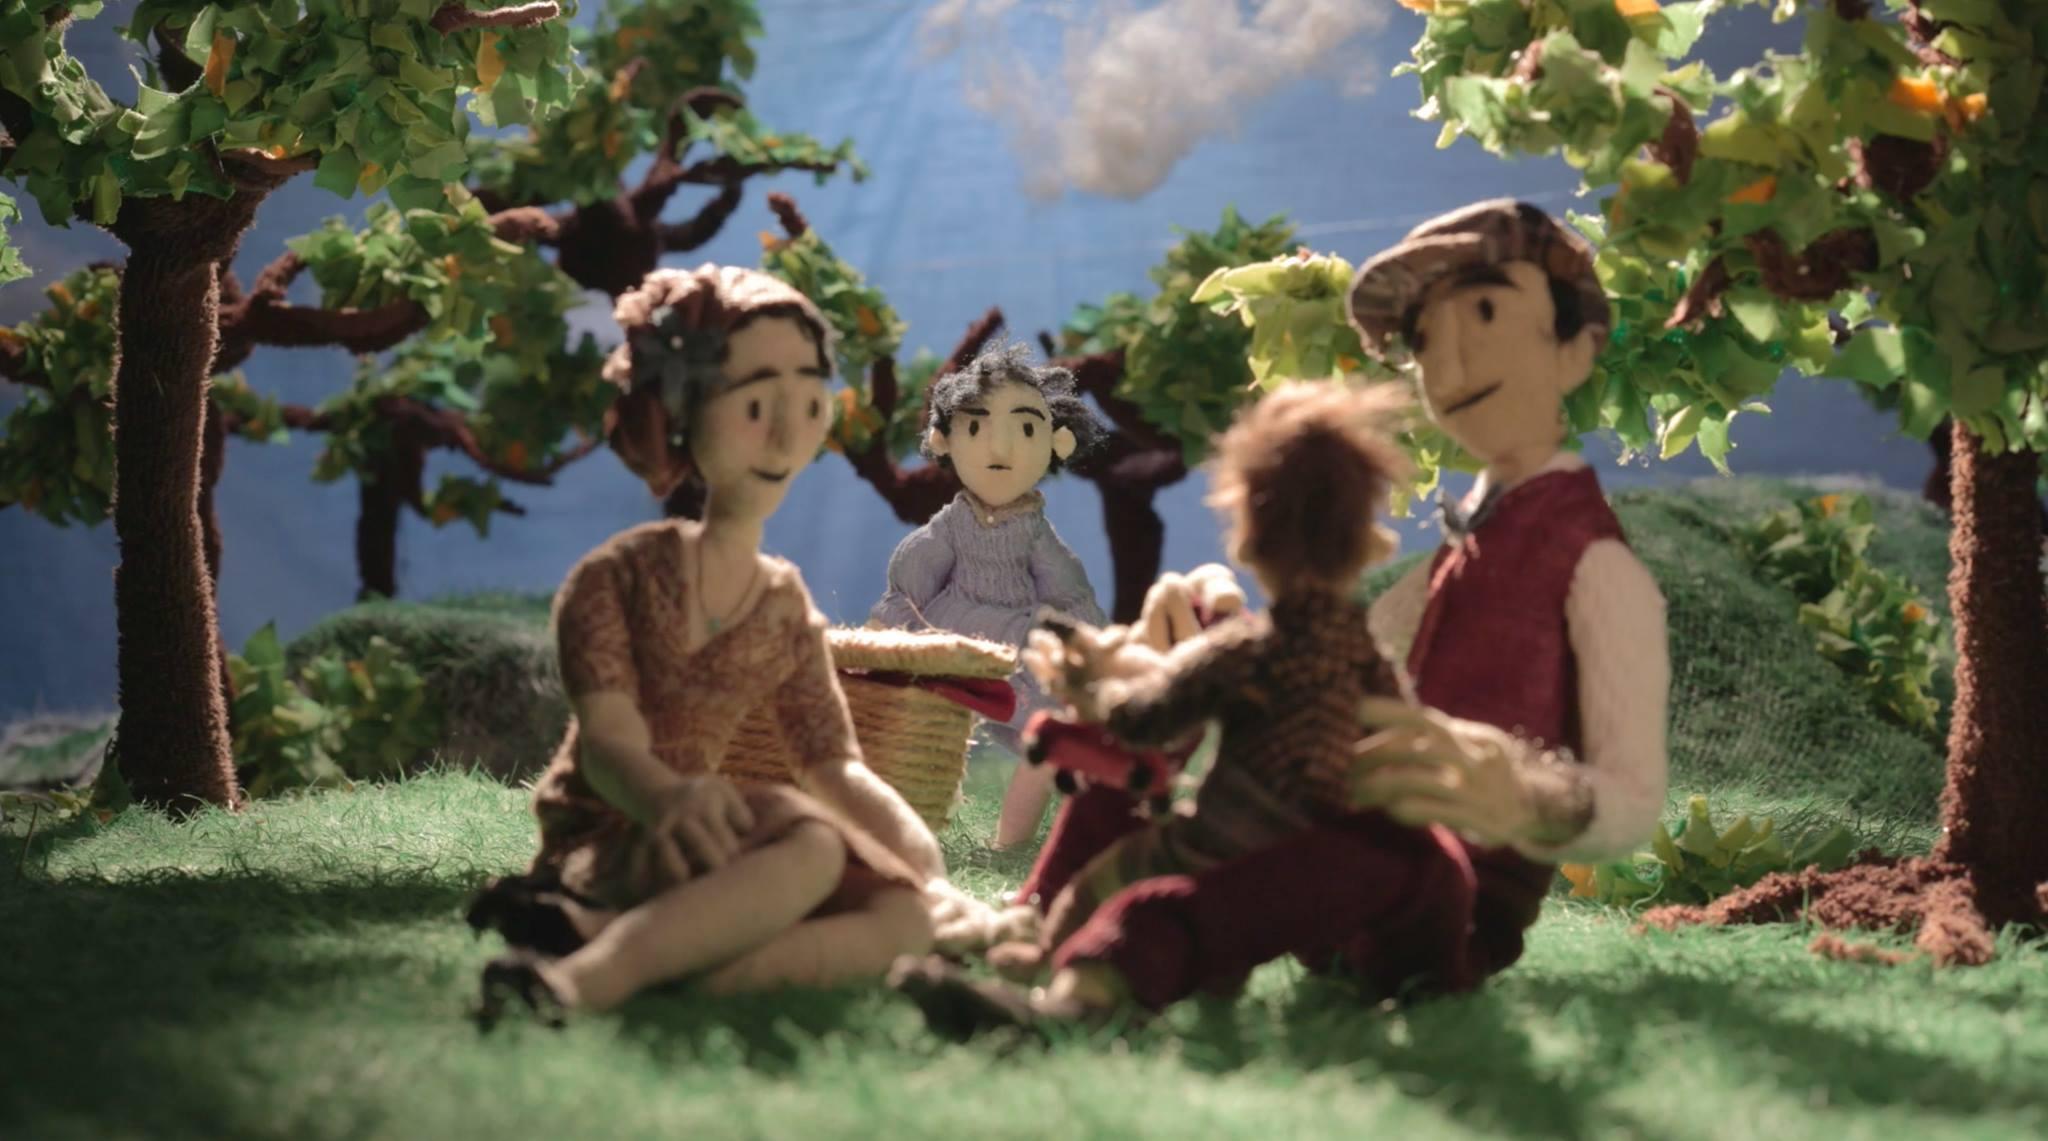 The Likes and Dislikes of Marj Bagley - Original Score | Animation